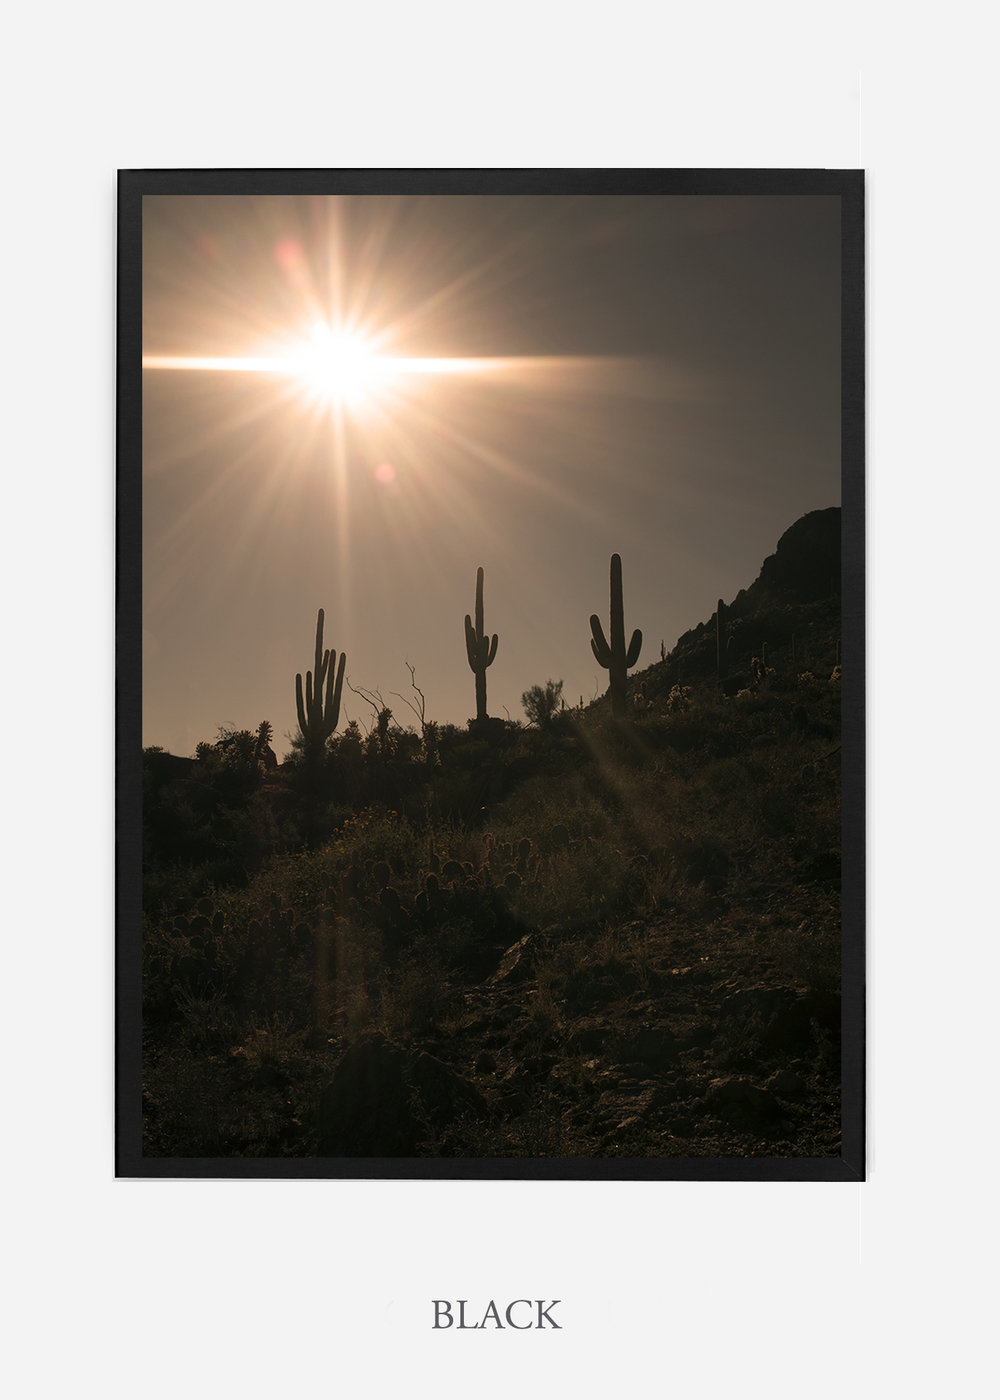 nomat-blackframe-saguaroNo.16-wildercalifornia-art-wallart-cactusprint-homedecor-prints-arizona-botanical-artwork-interiordesign.jpg